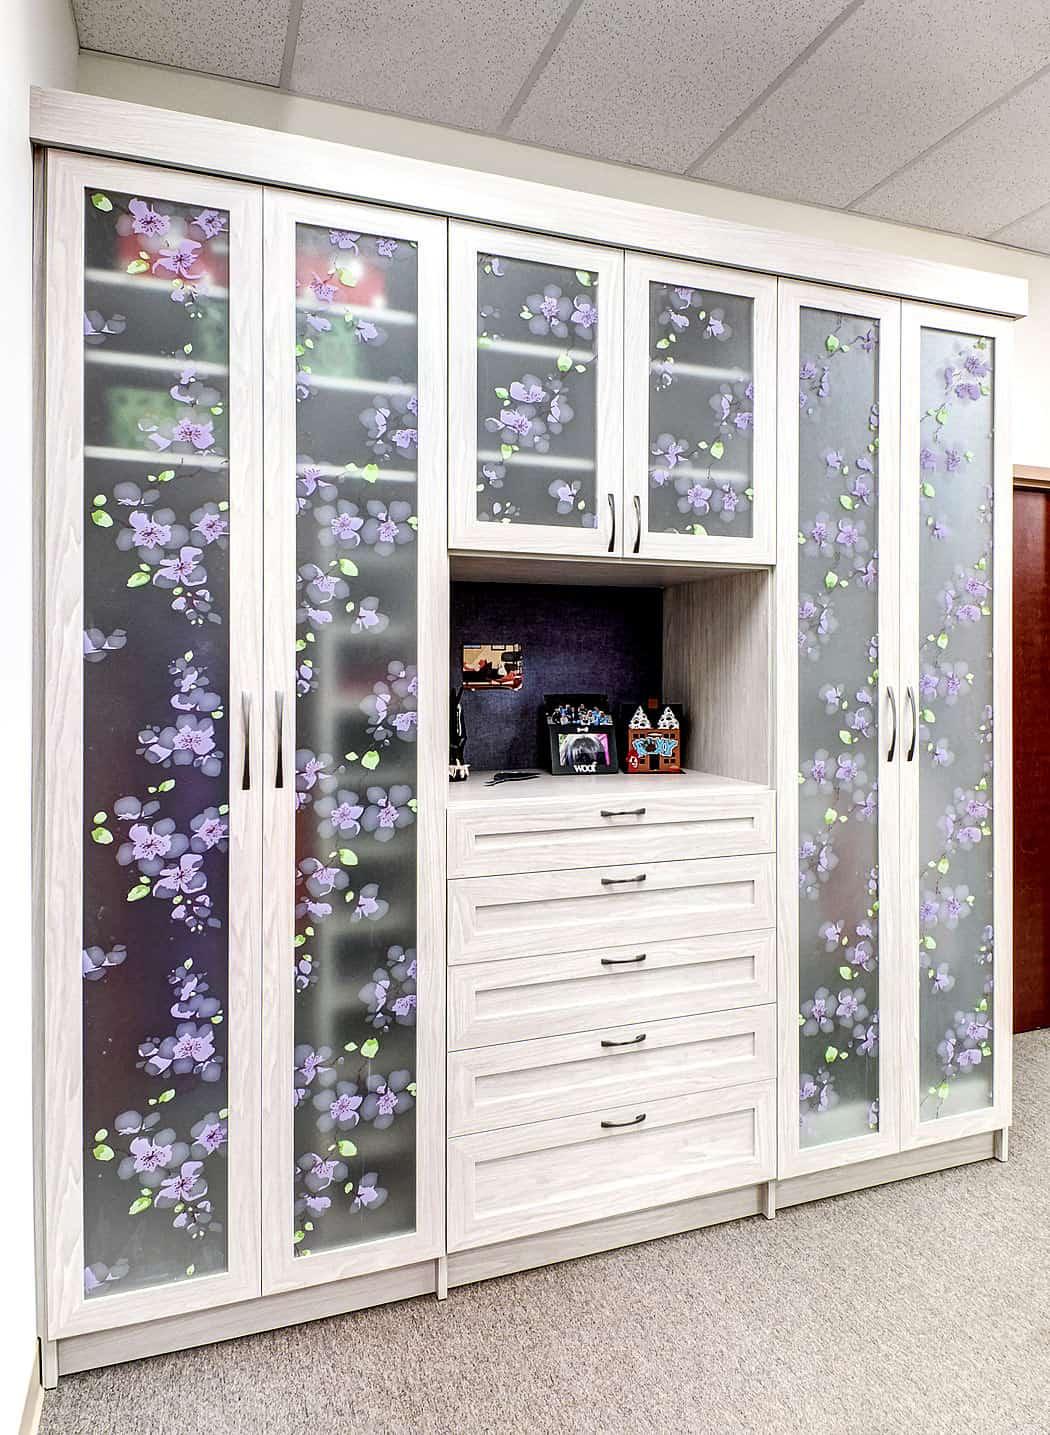 250 Bedroom Closet Ideas for 2019